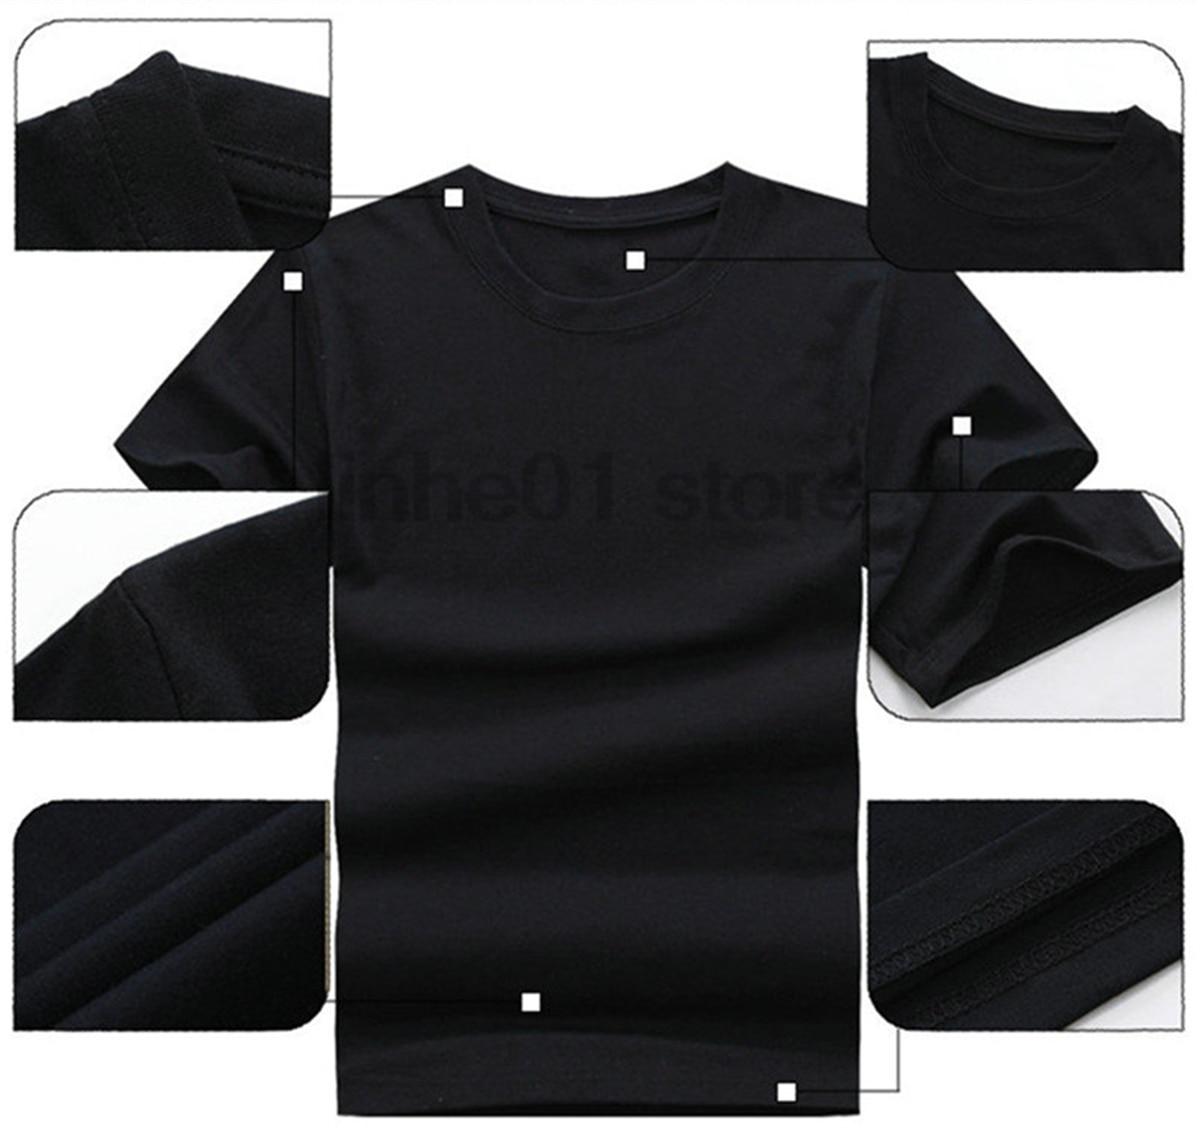 GILDAN Daddy Shirt Fathers Day Gift Heart Dad Husband Mothers Day Ms. T-shirt Womens T-shirt